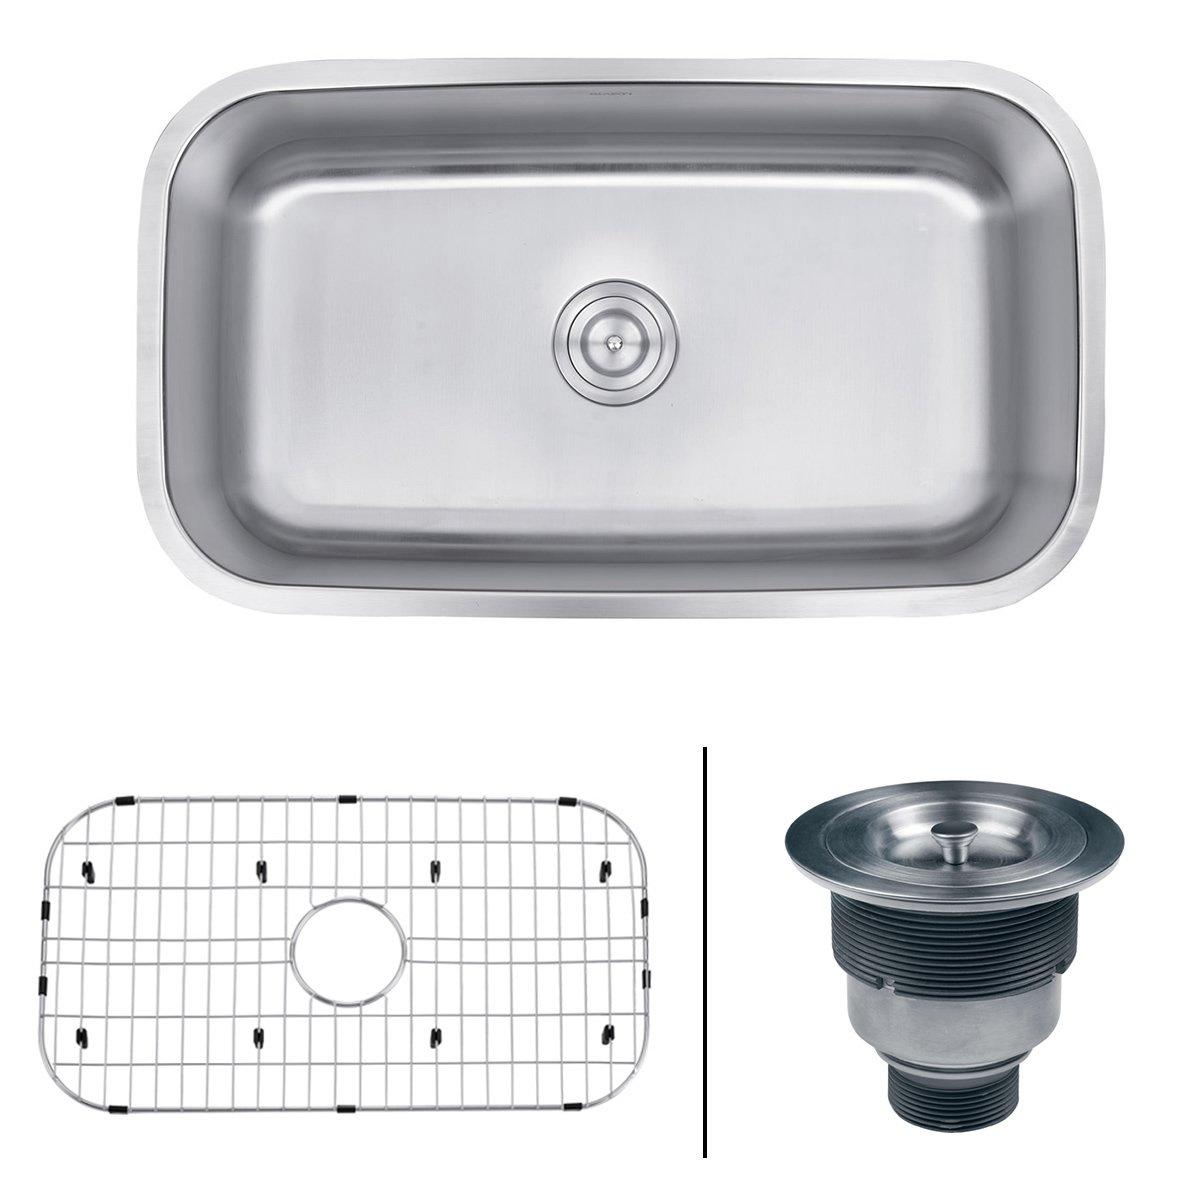 Ruvati 32-inch Undermount 16 Gauge Stainless Steel Kitchen Sink Single Bowl - RVM4200